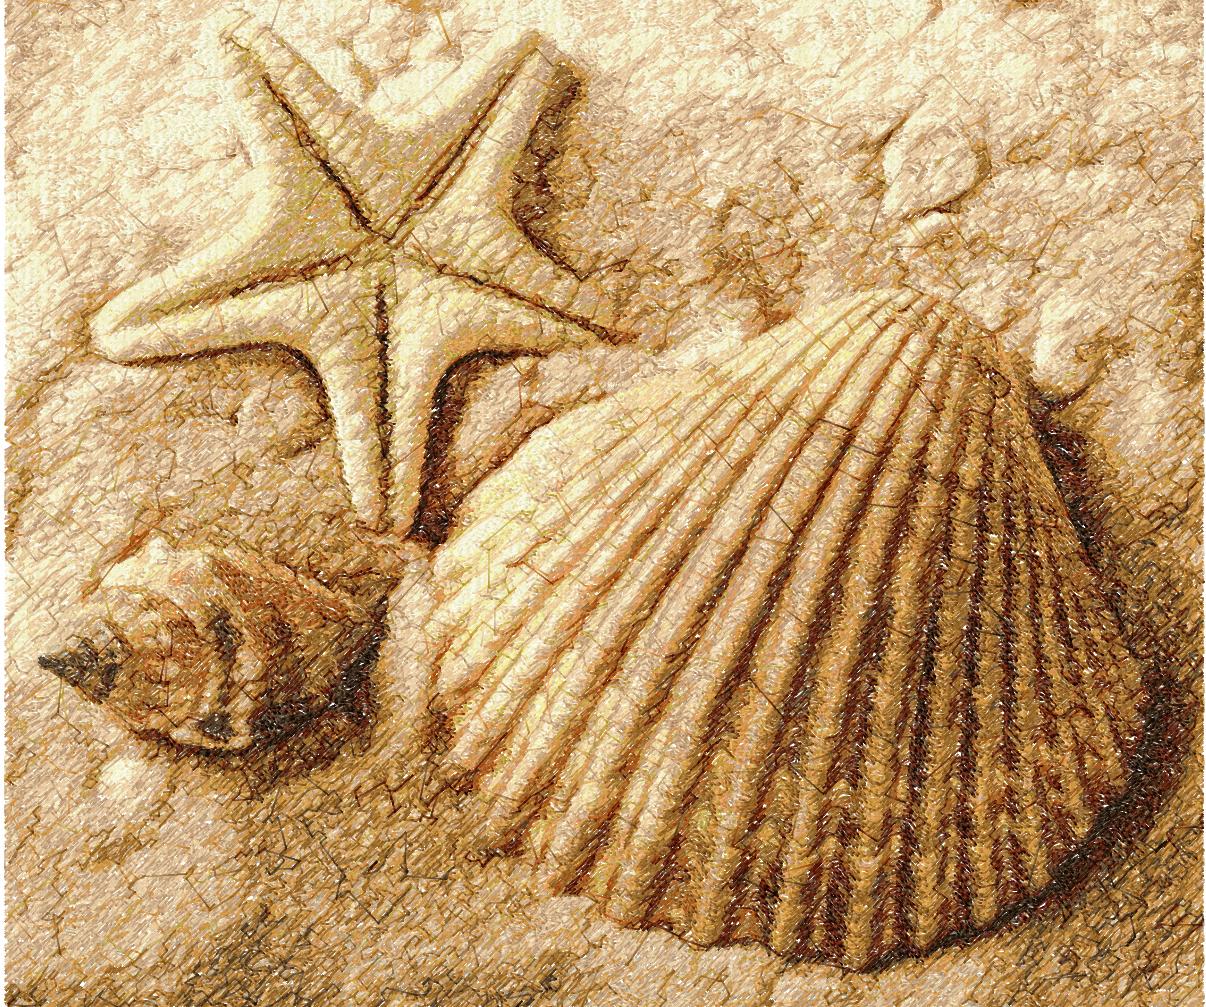 Sea shell photo stitch free embroidery design